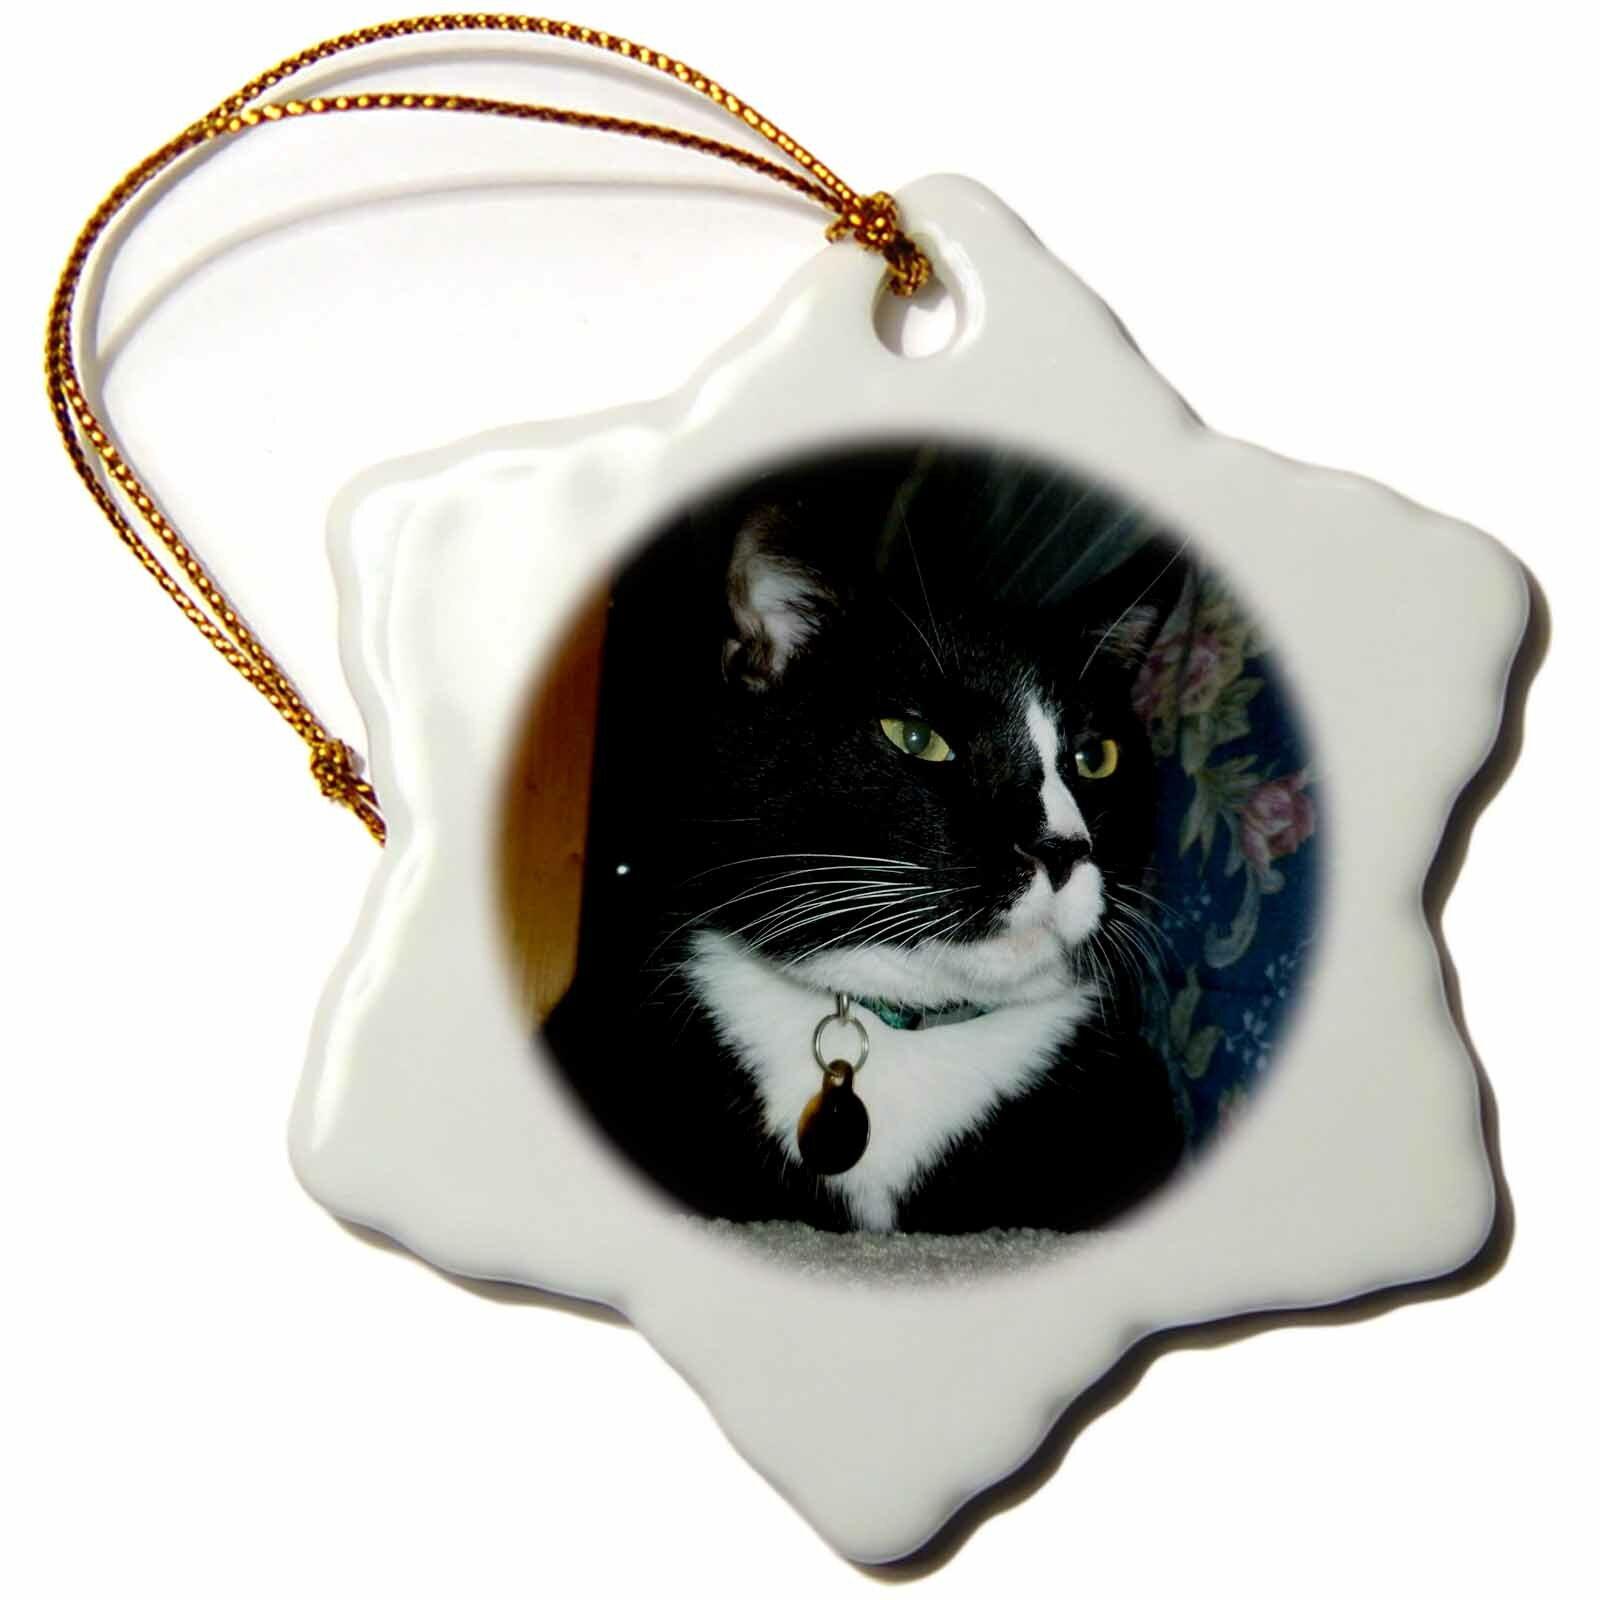 The Holiday Aisle Tuxedo Cat Snowflake Holiday Shaped Ornament Wayfair